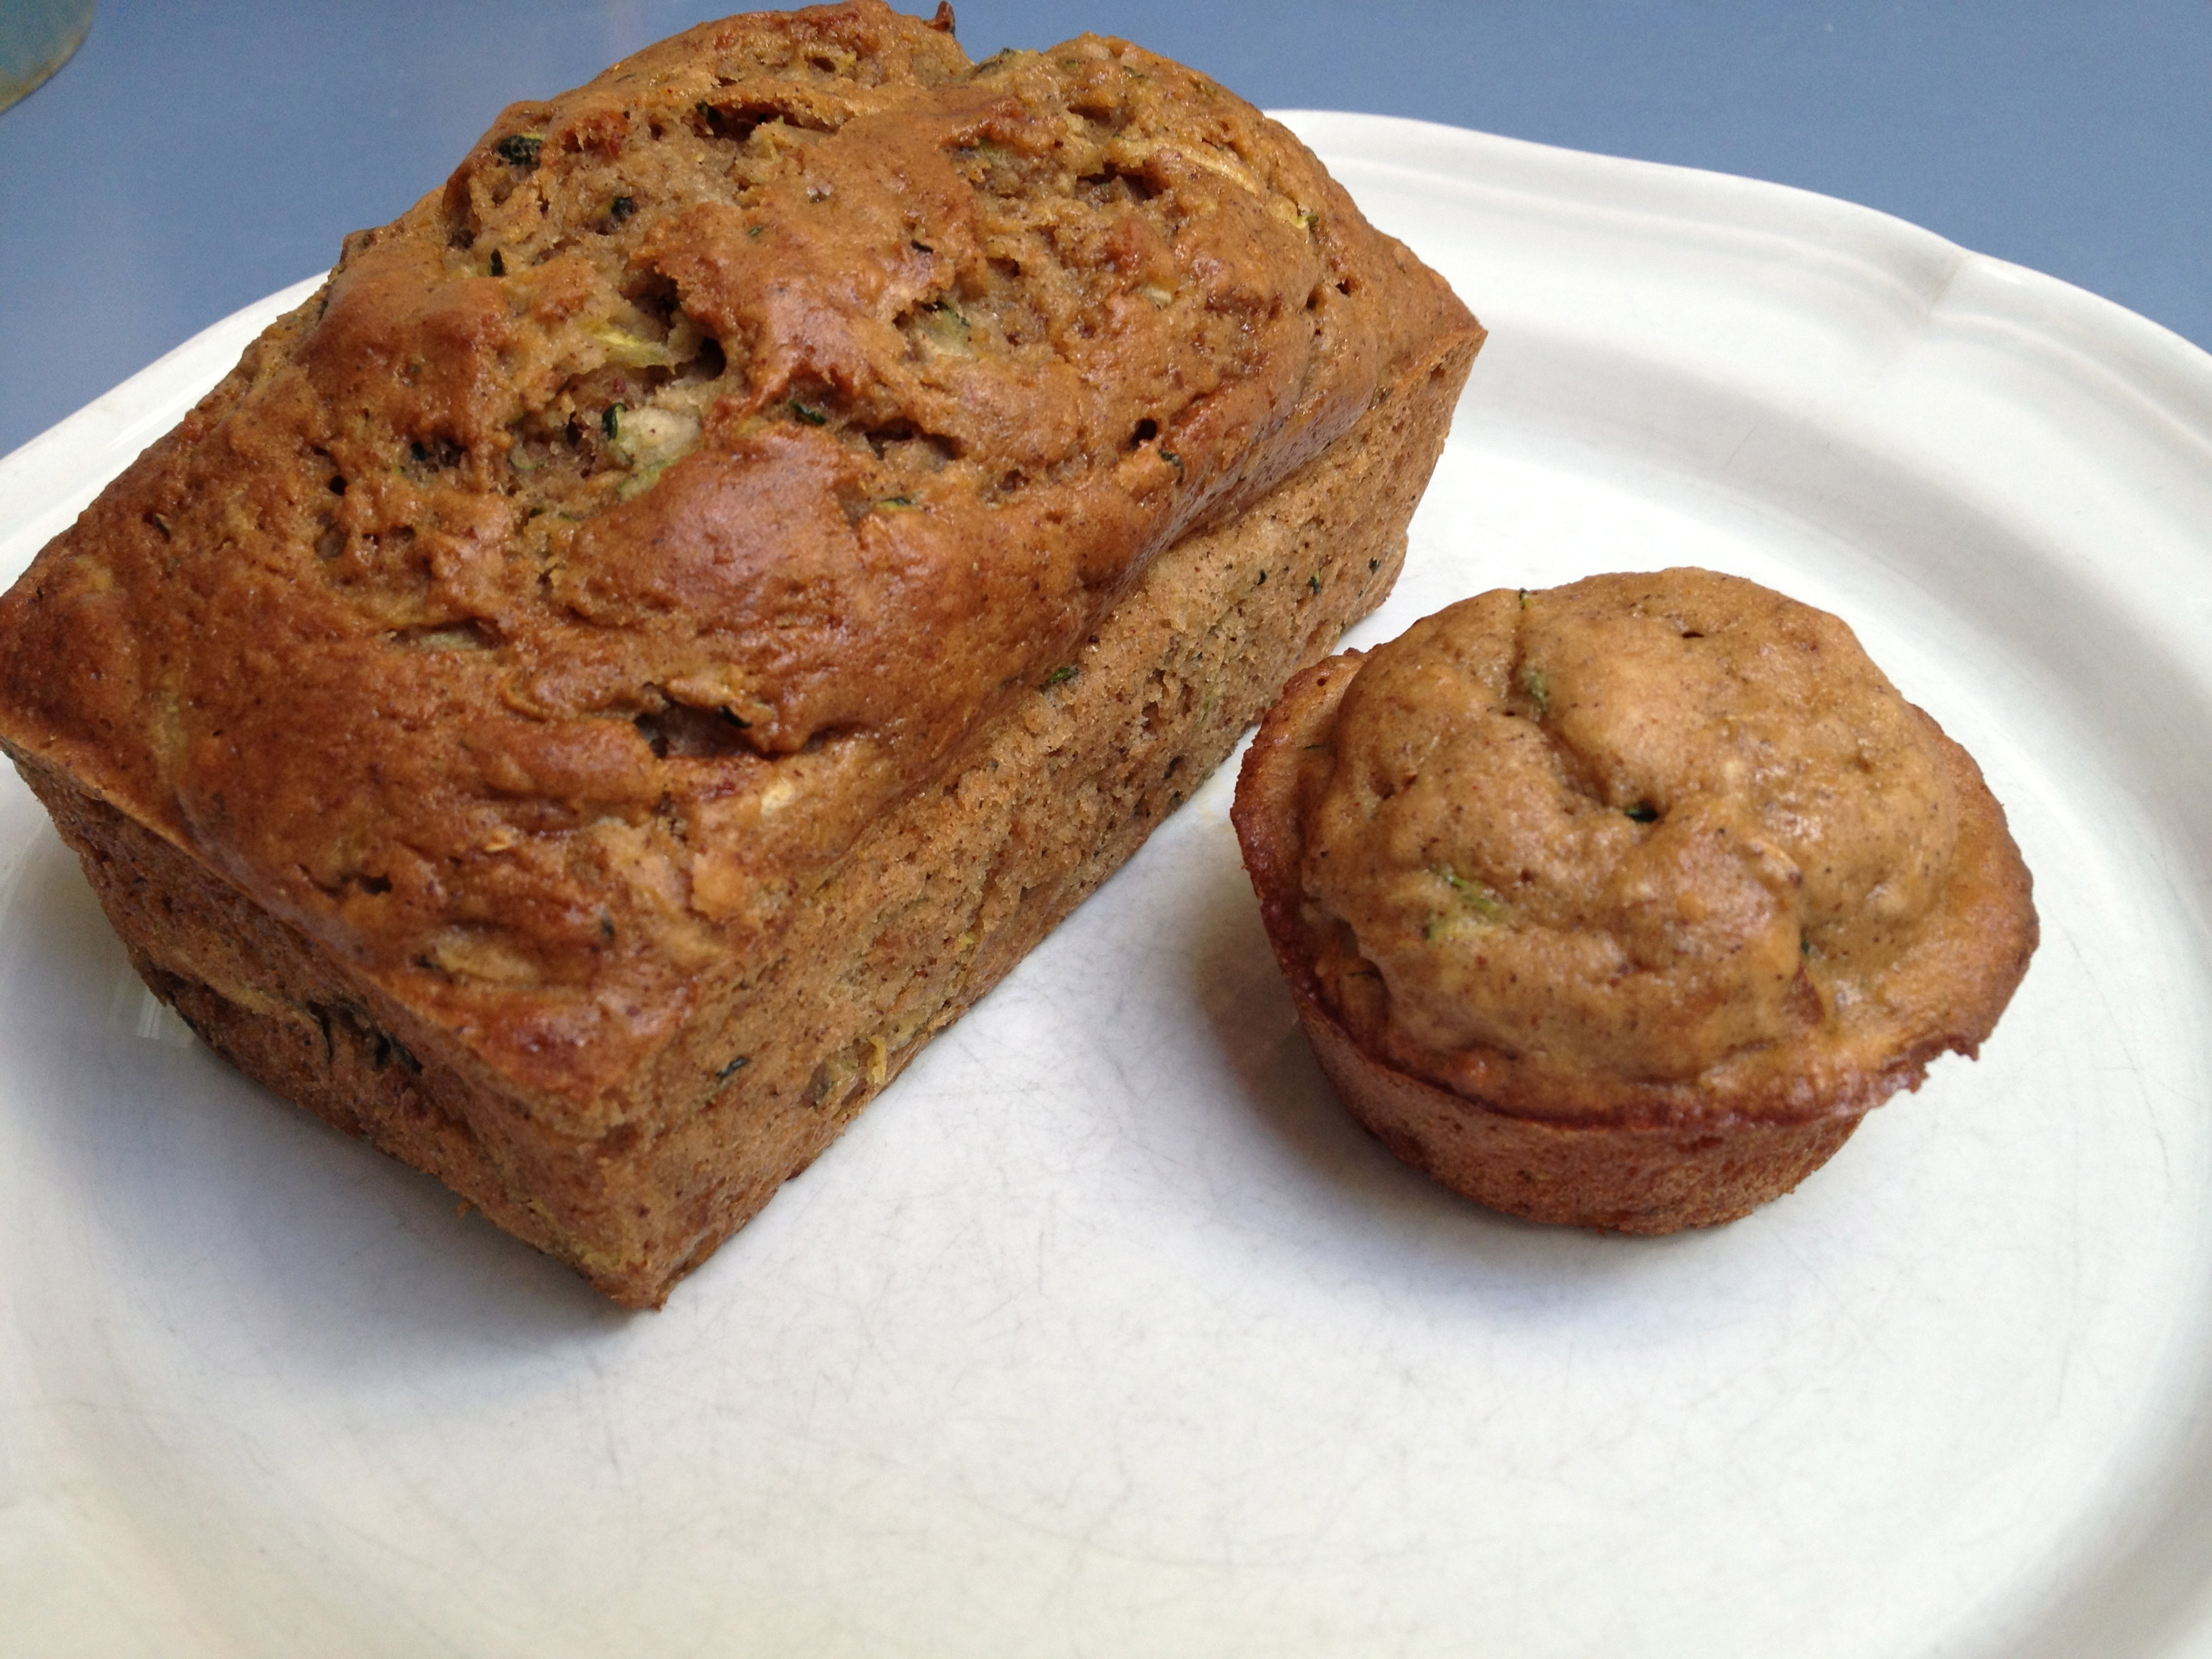 Healthy Zuchinni Bread  Zucchini Bread healthy style – Growing Weisser